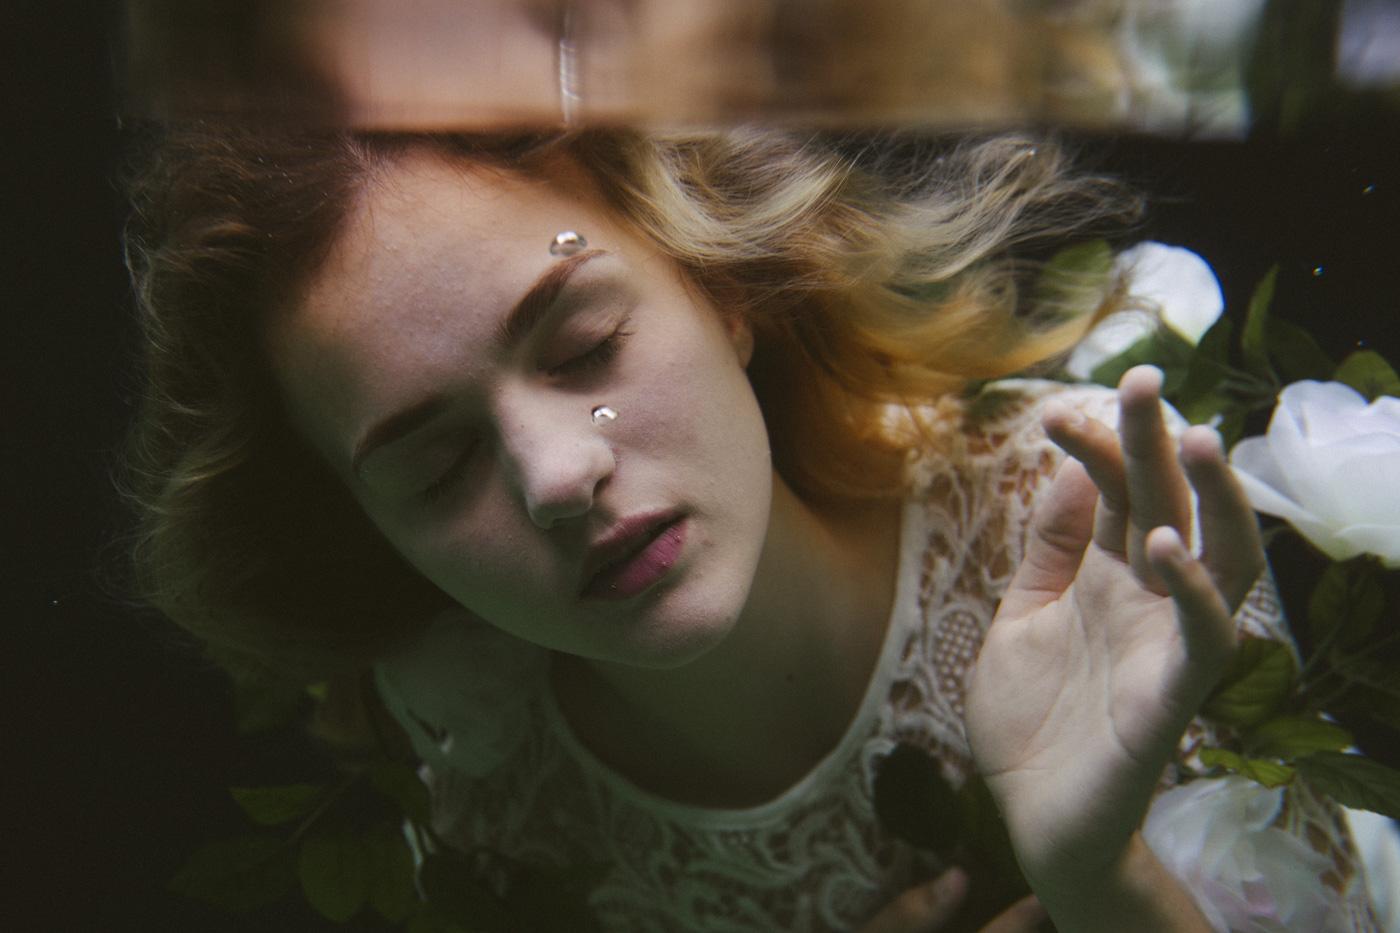 Rebekah_Kamsky_Photography_kAtyPerry_Warmer_Colours_(7_of_7).jpg